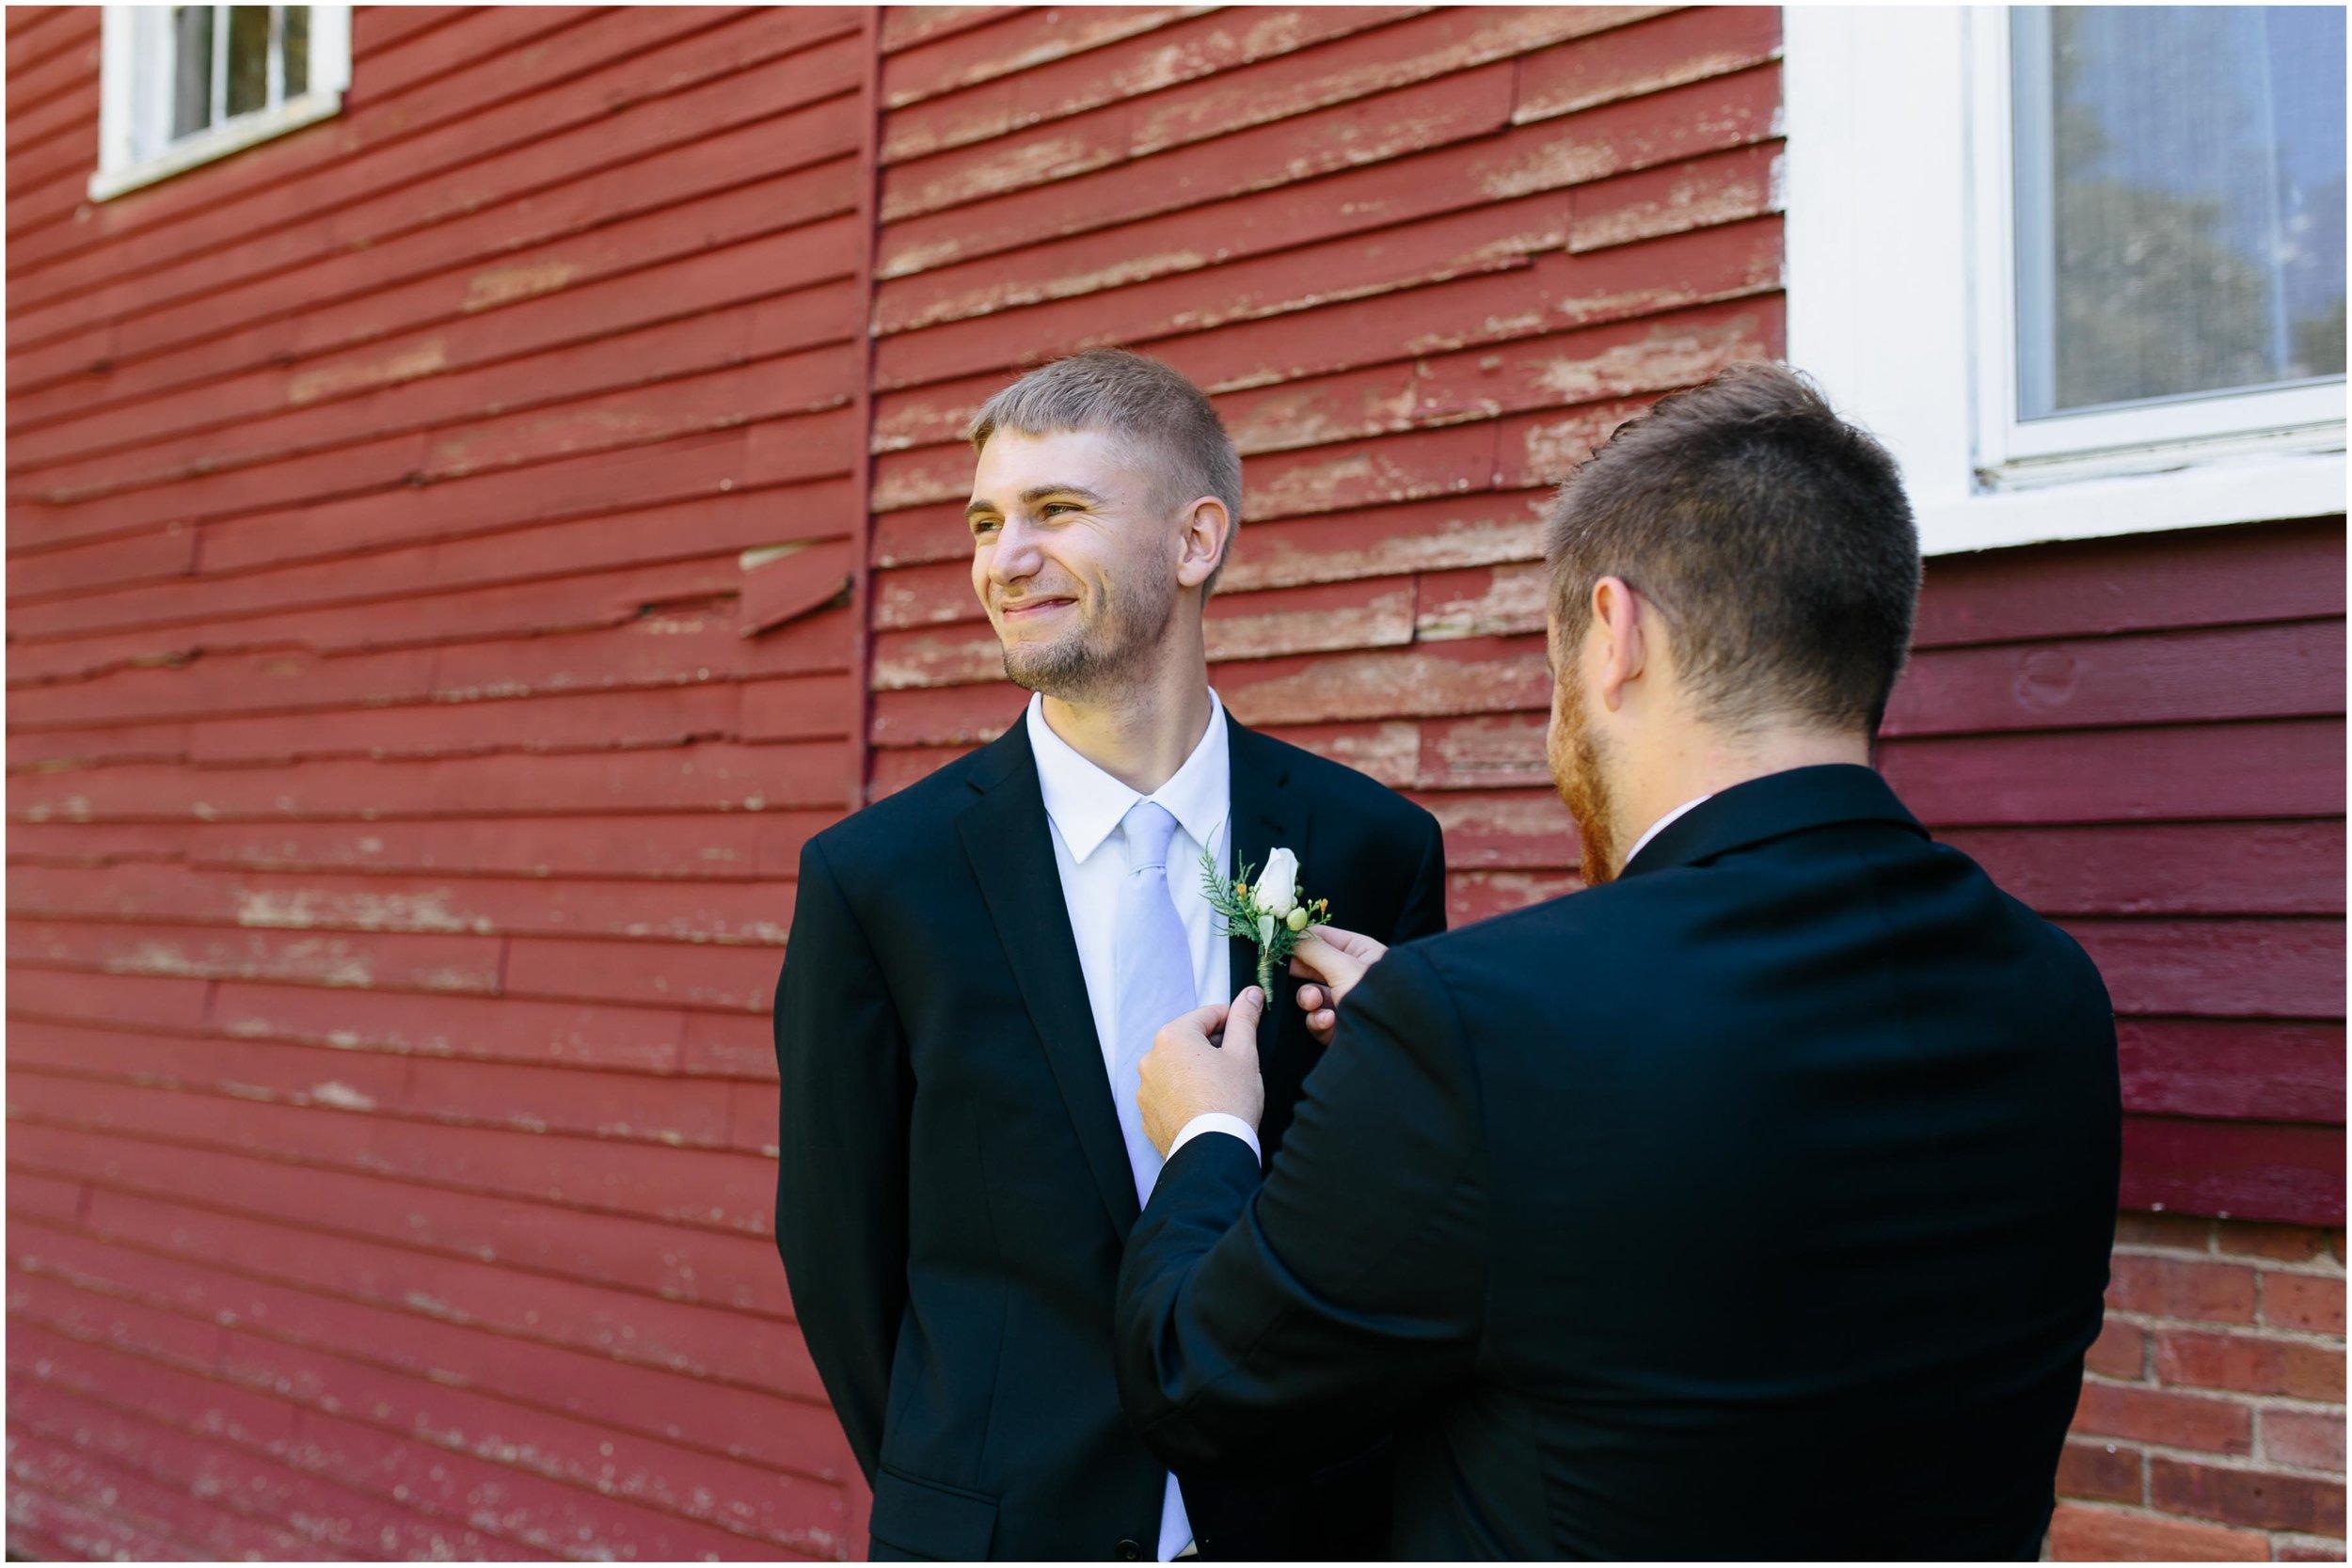 Cozy Country Church Wedding in Pepperell, Massachusetts groom